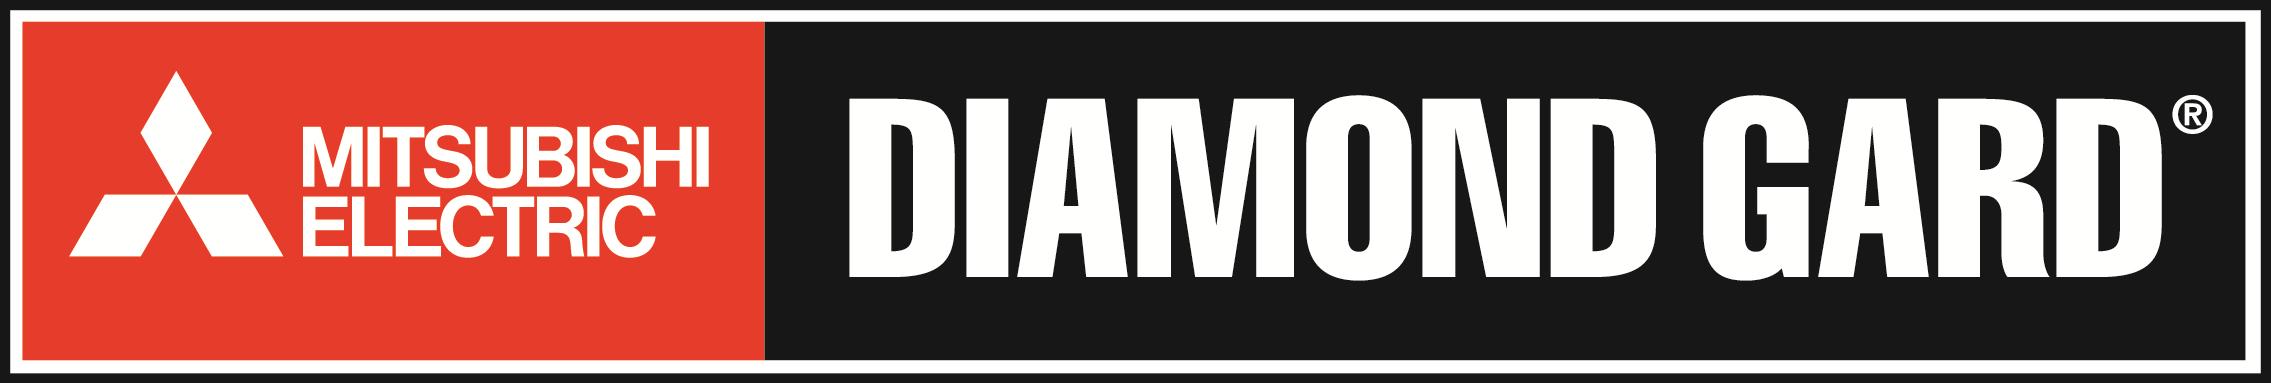 Mitsubishi Electric Diamond Gard Logo